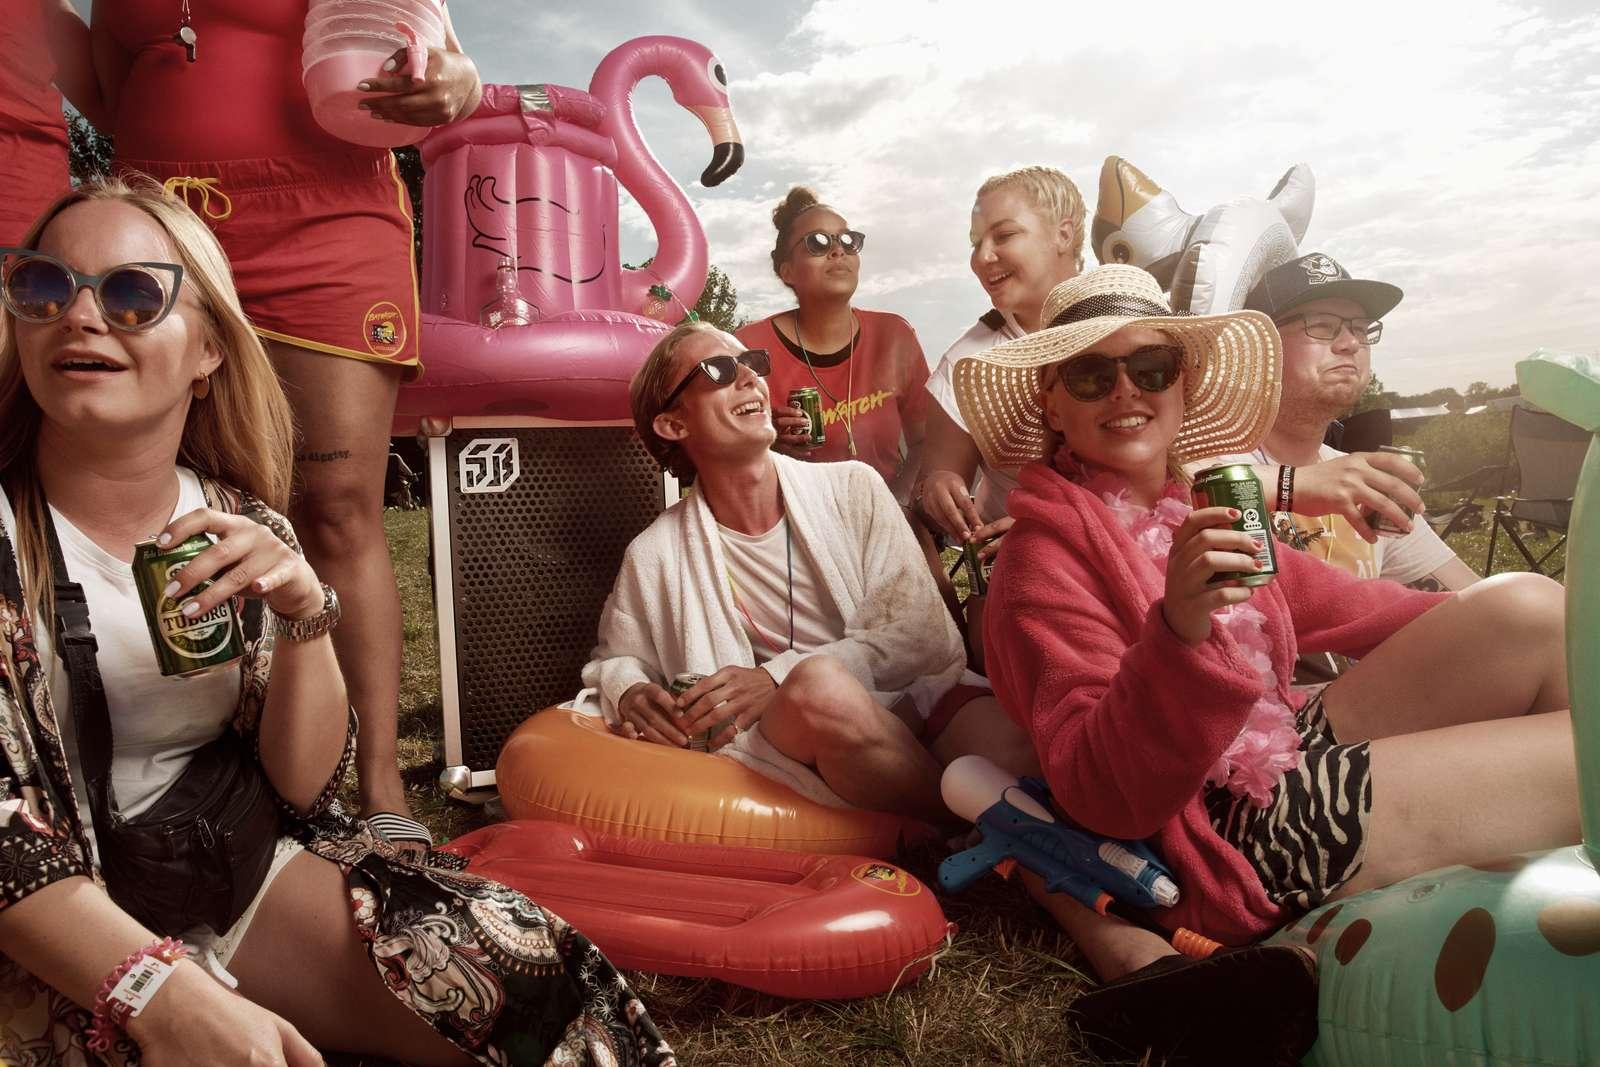 Pa stan torsdag karneval pa hog niva